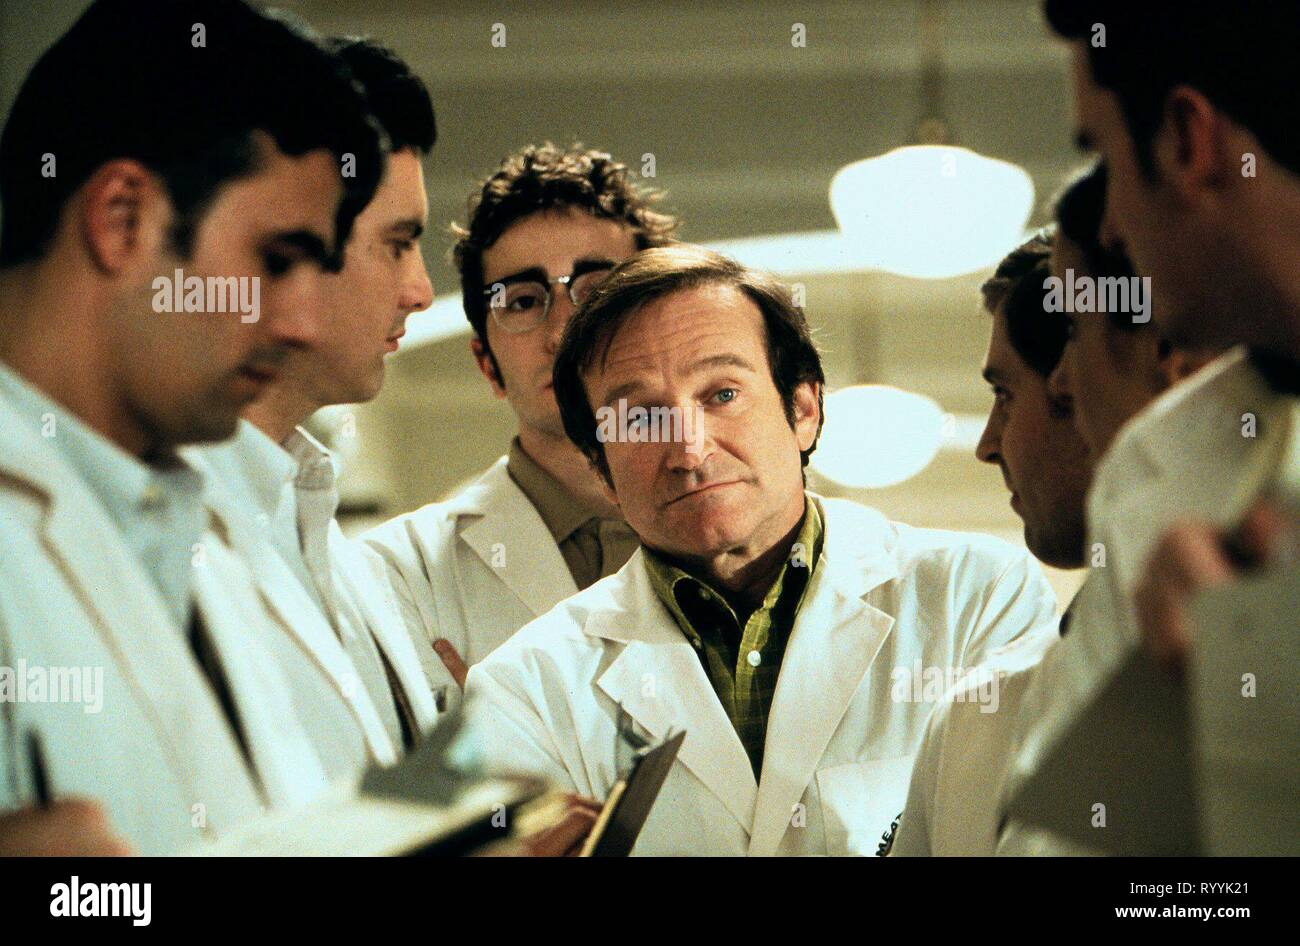 Robin Williams Patch Adams 1998 Stock Photo Alamy